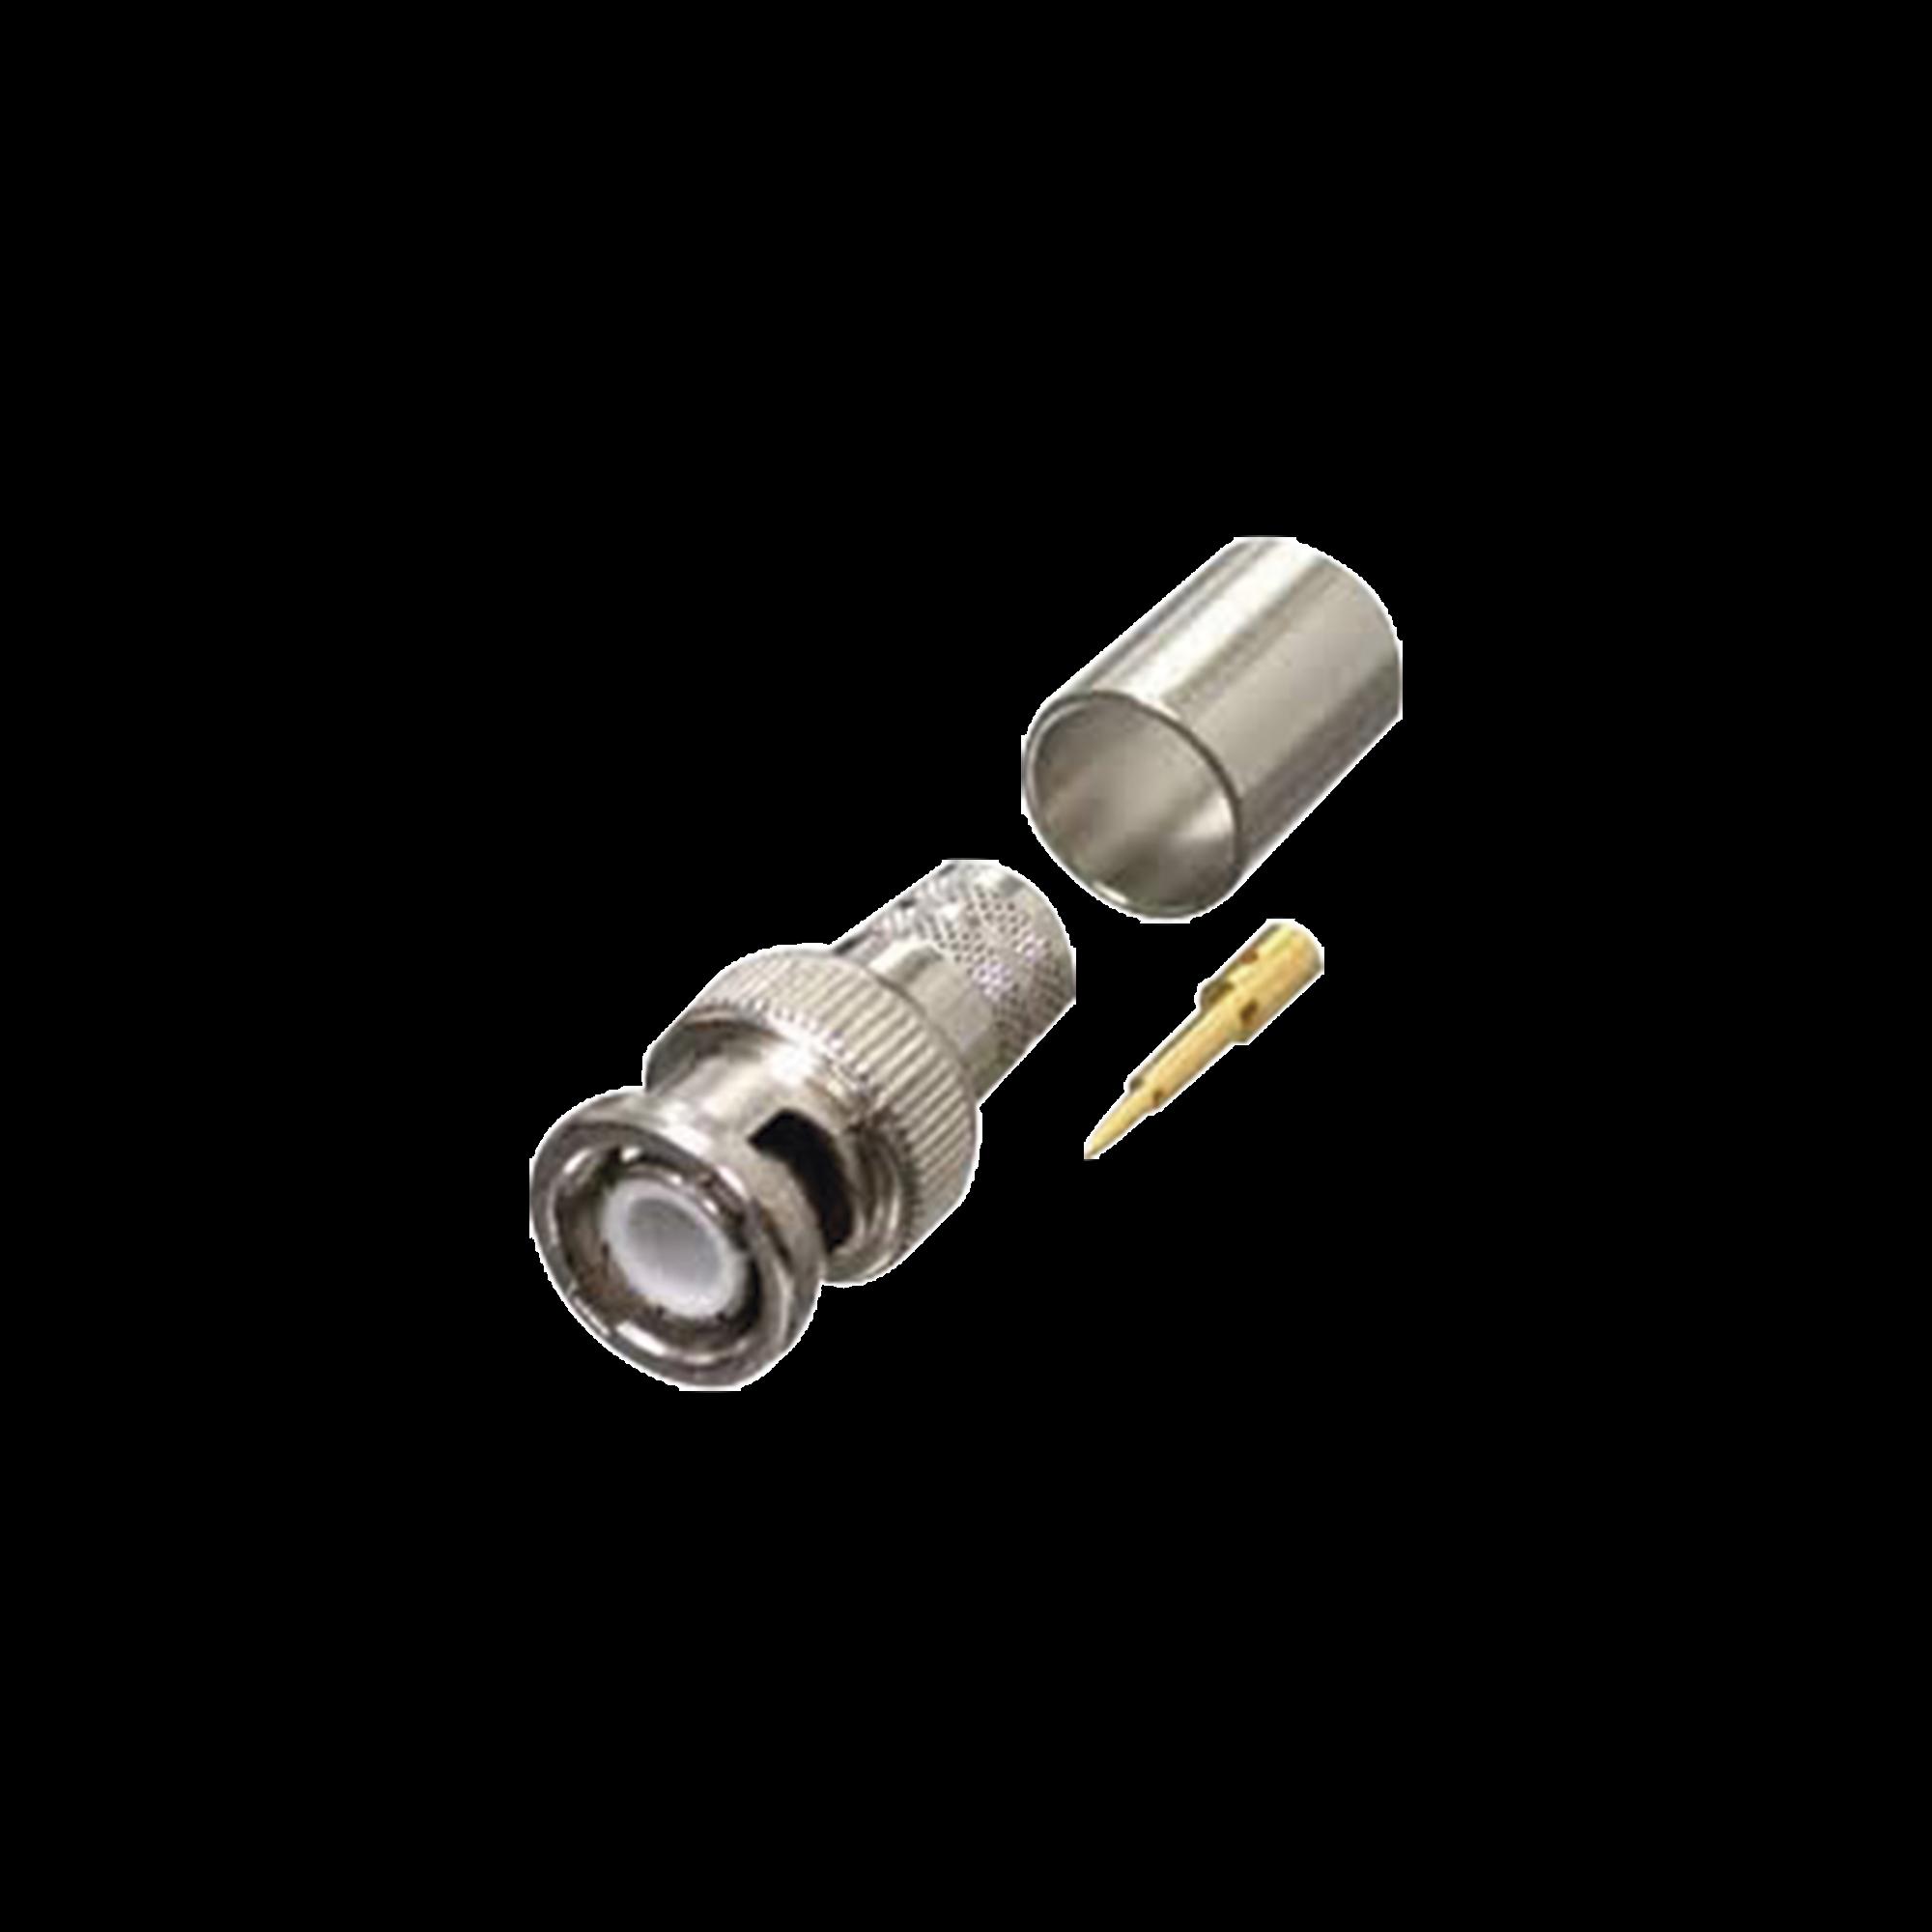 Conector BNC Macho de Anillo Plegable para RG-8/U, LMR-400, 9913, CNT-400, Ni/Au/Teflón.